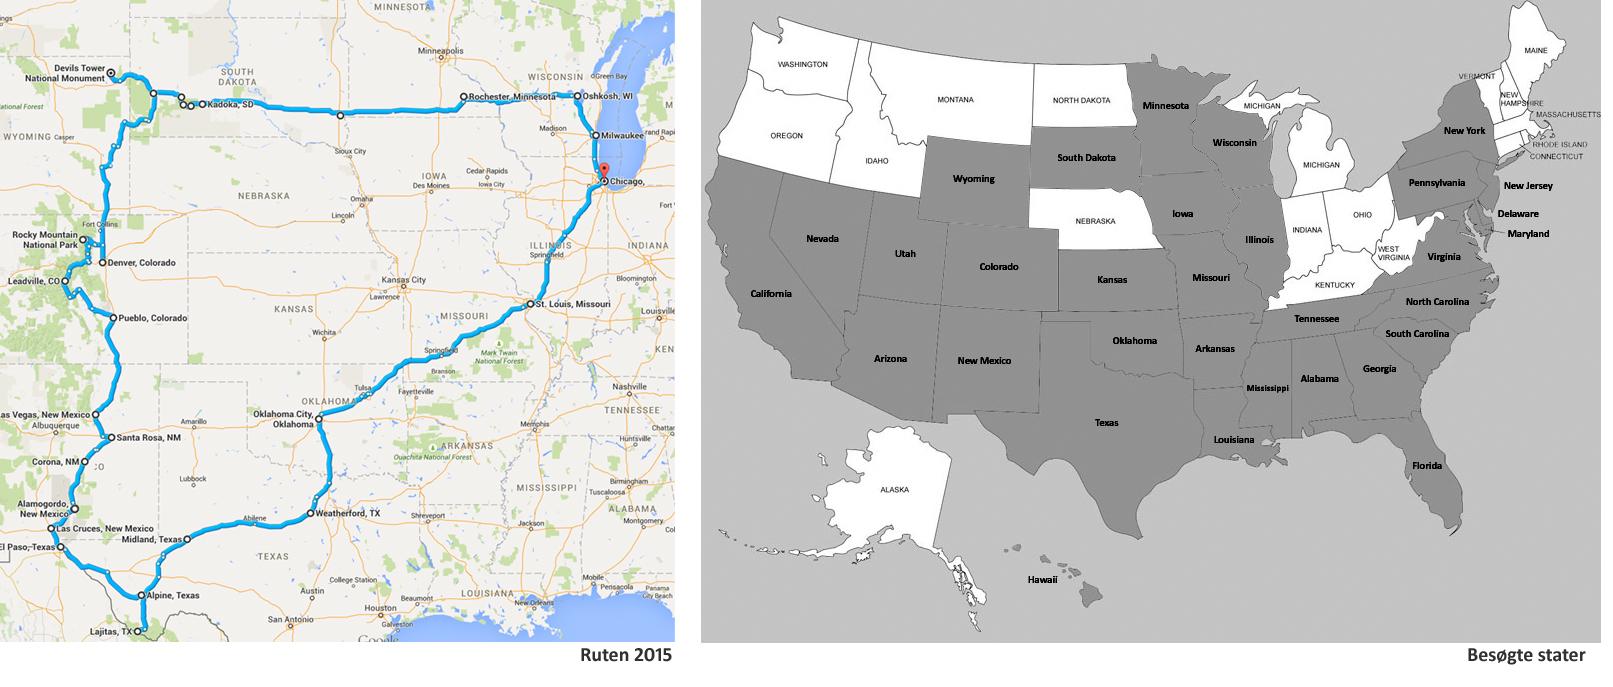 Rute 2015 & Besøgte Stater